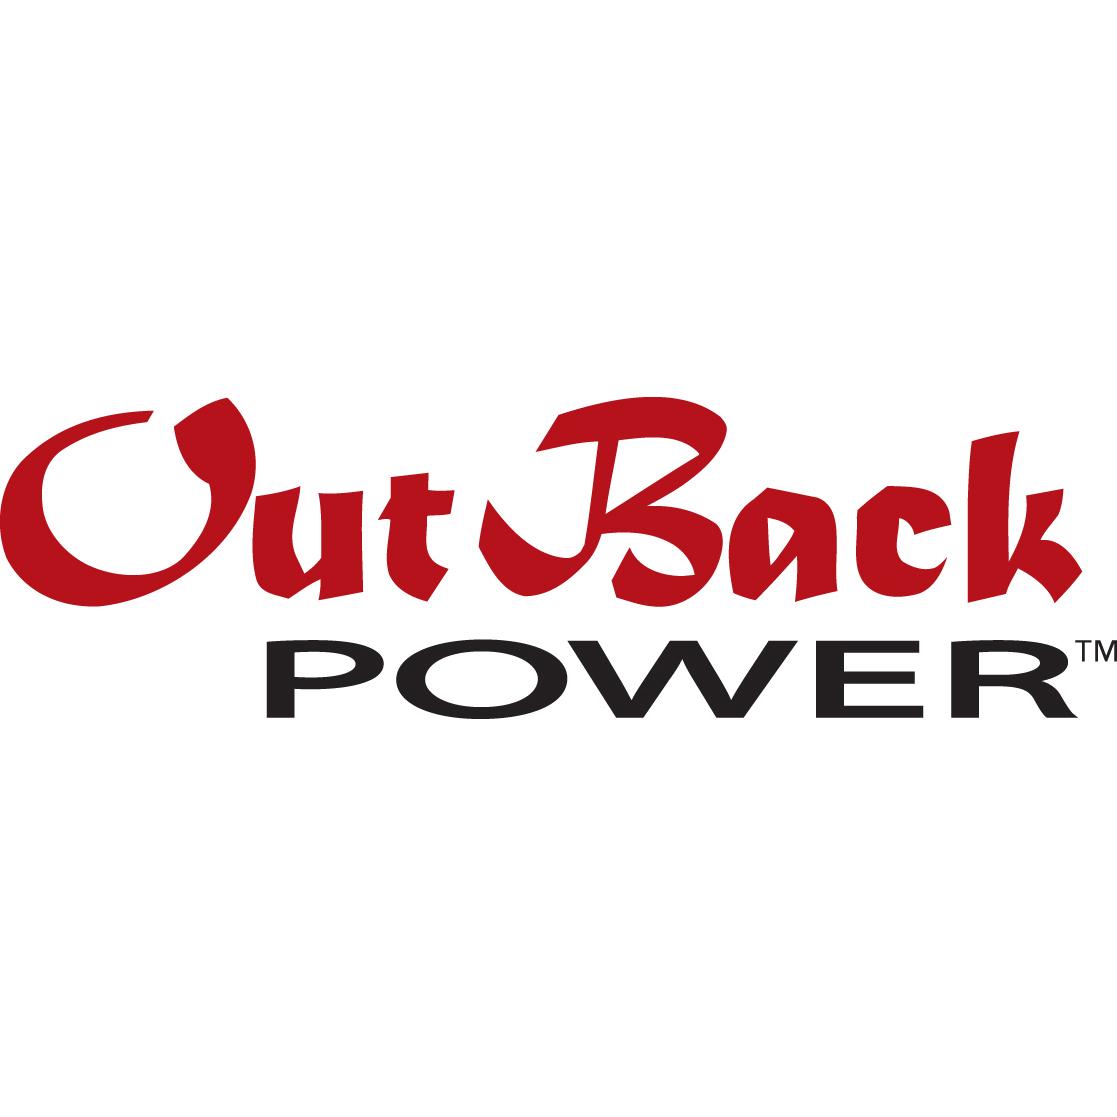 OutBack Power - Twende Solar